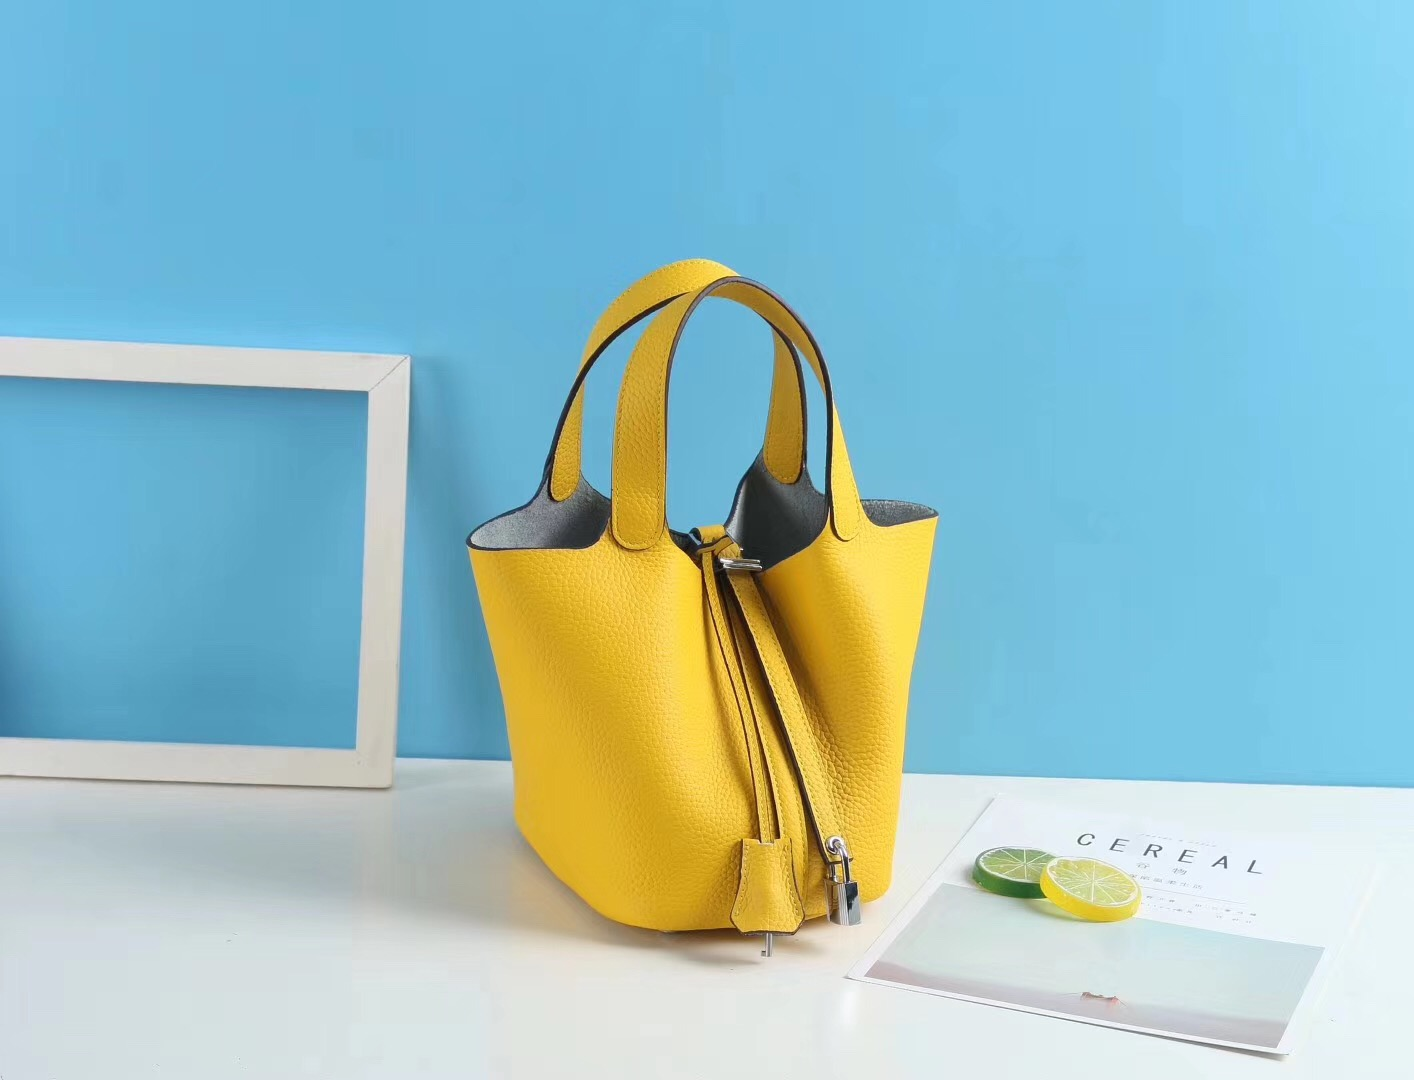 mulheres sacos de designer de marca famosa saco crossbody bolsa feminina